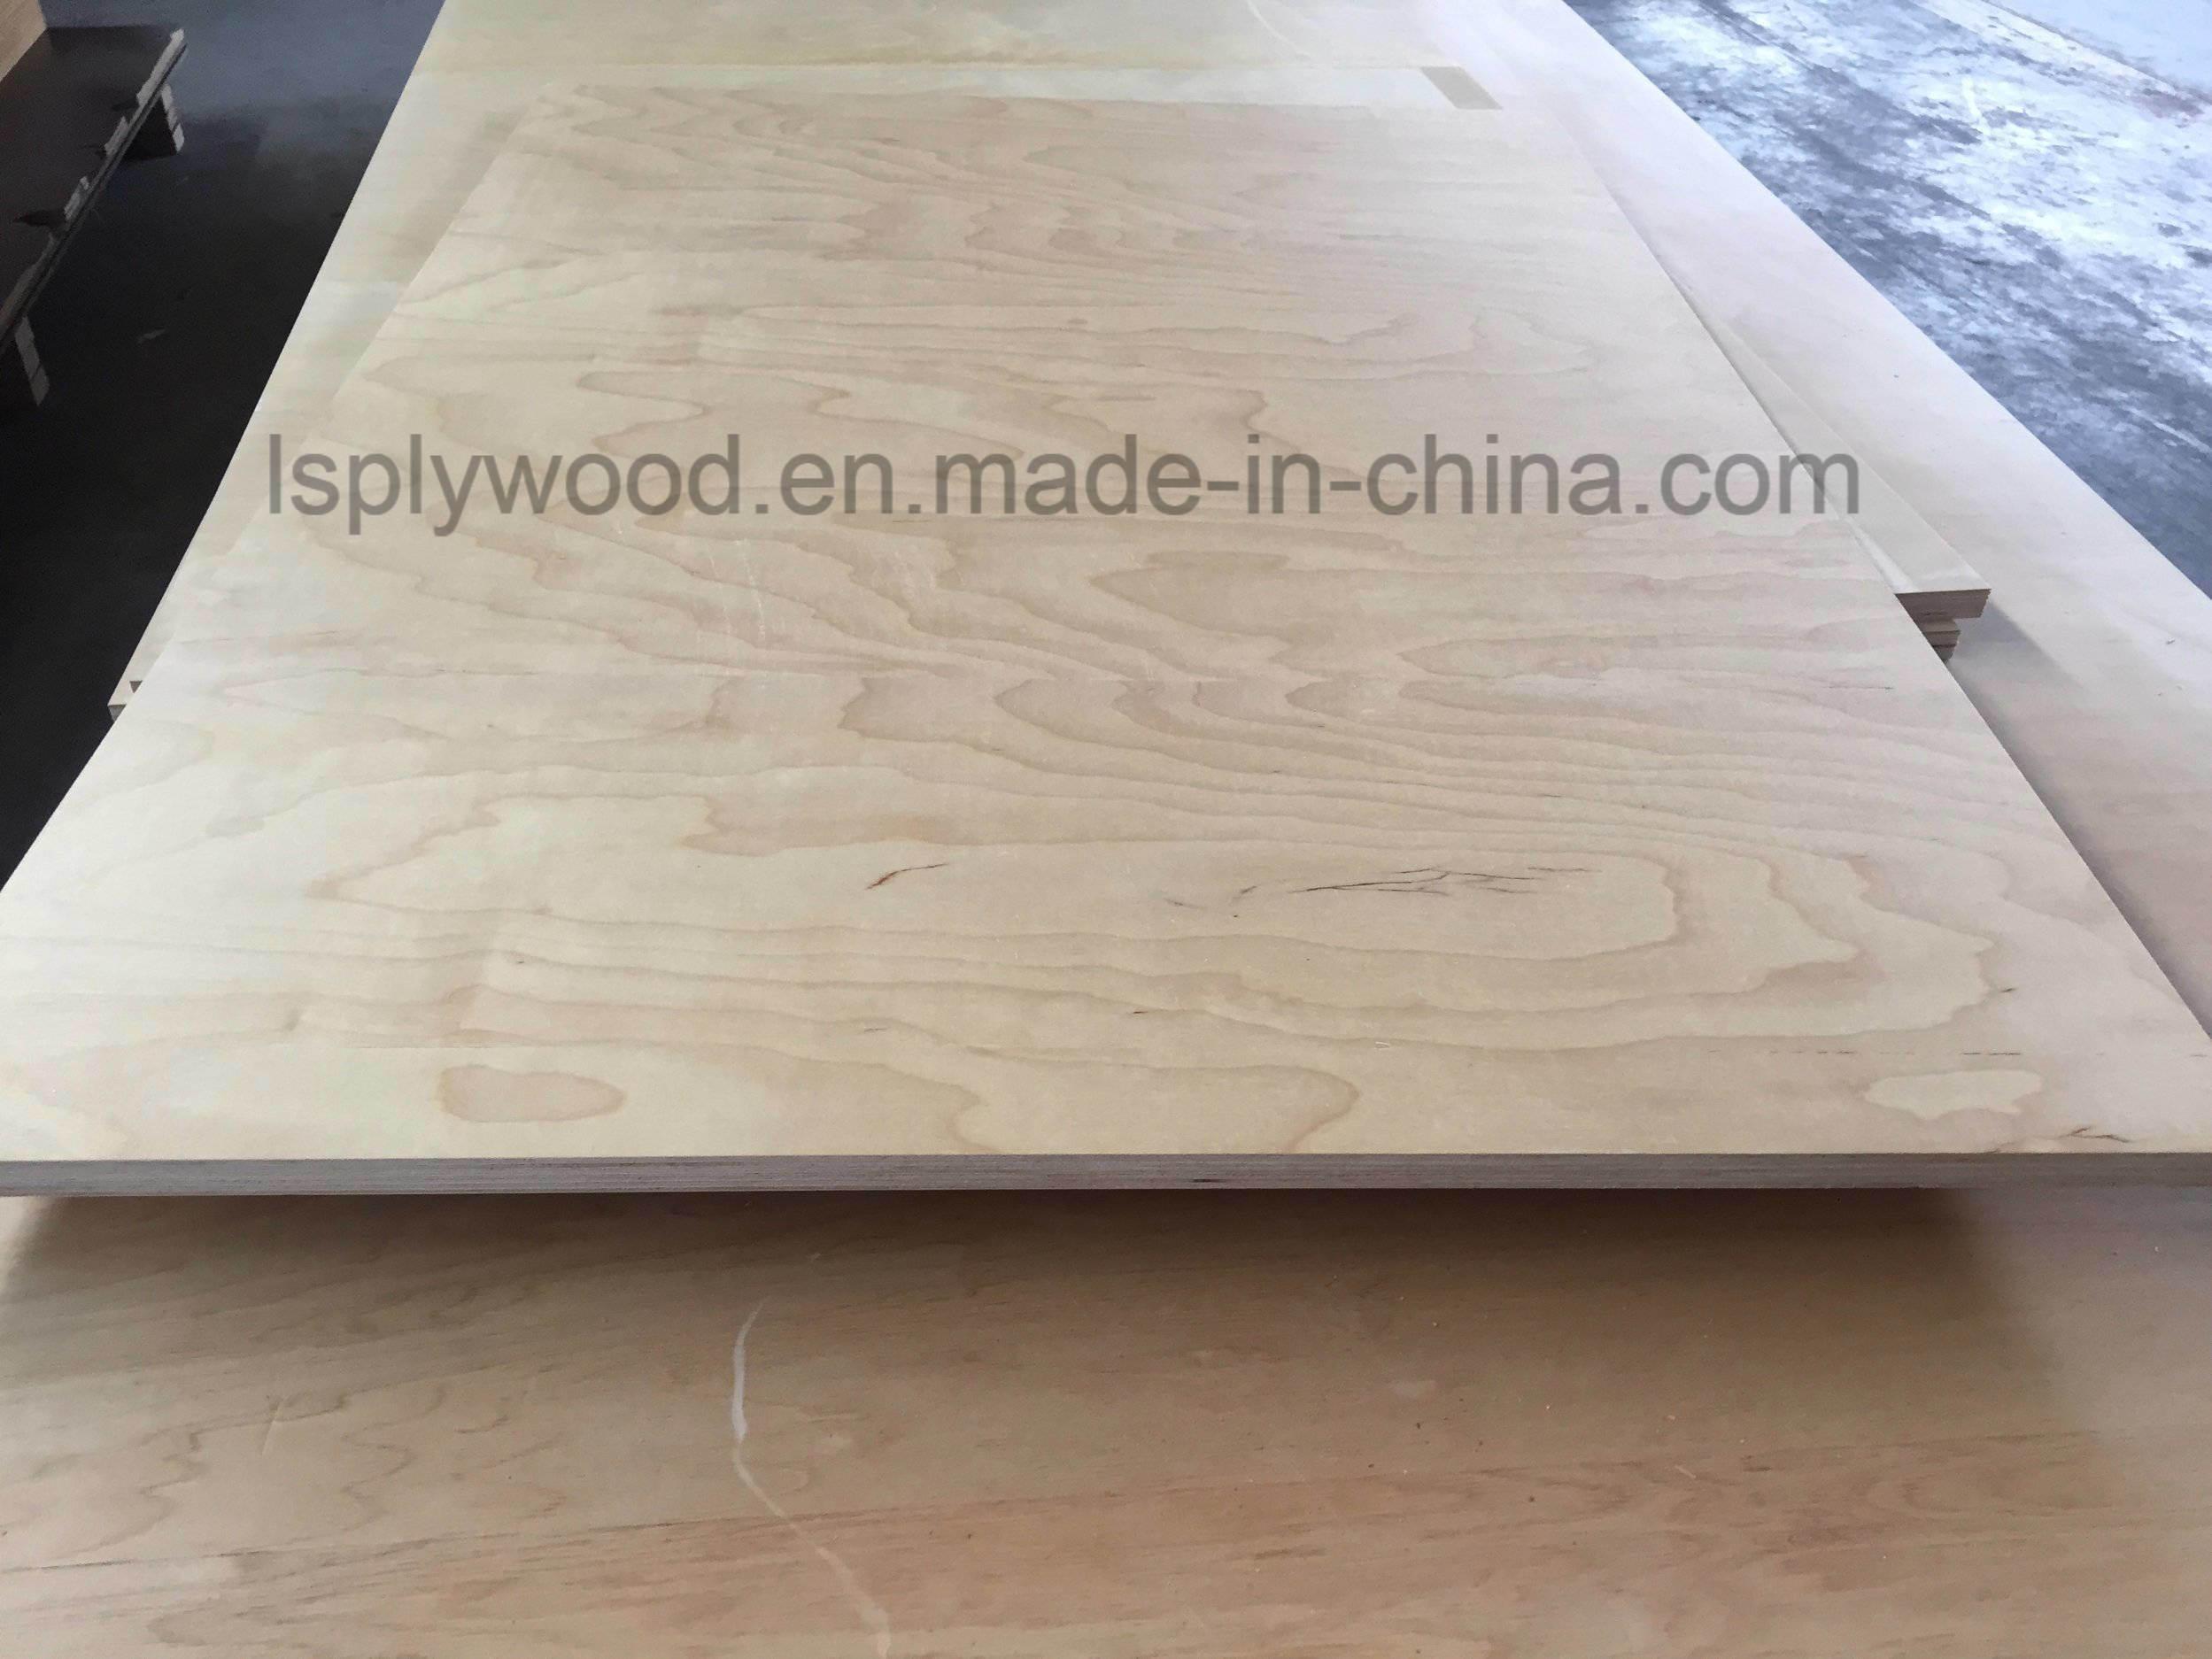 China Industry Waterproofing